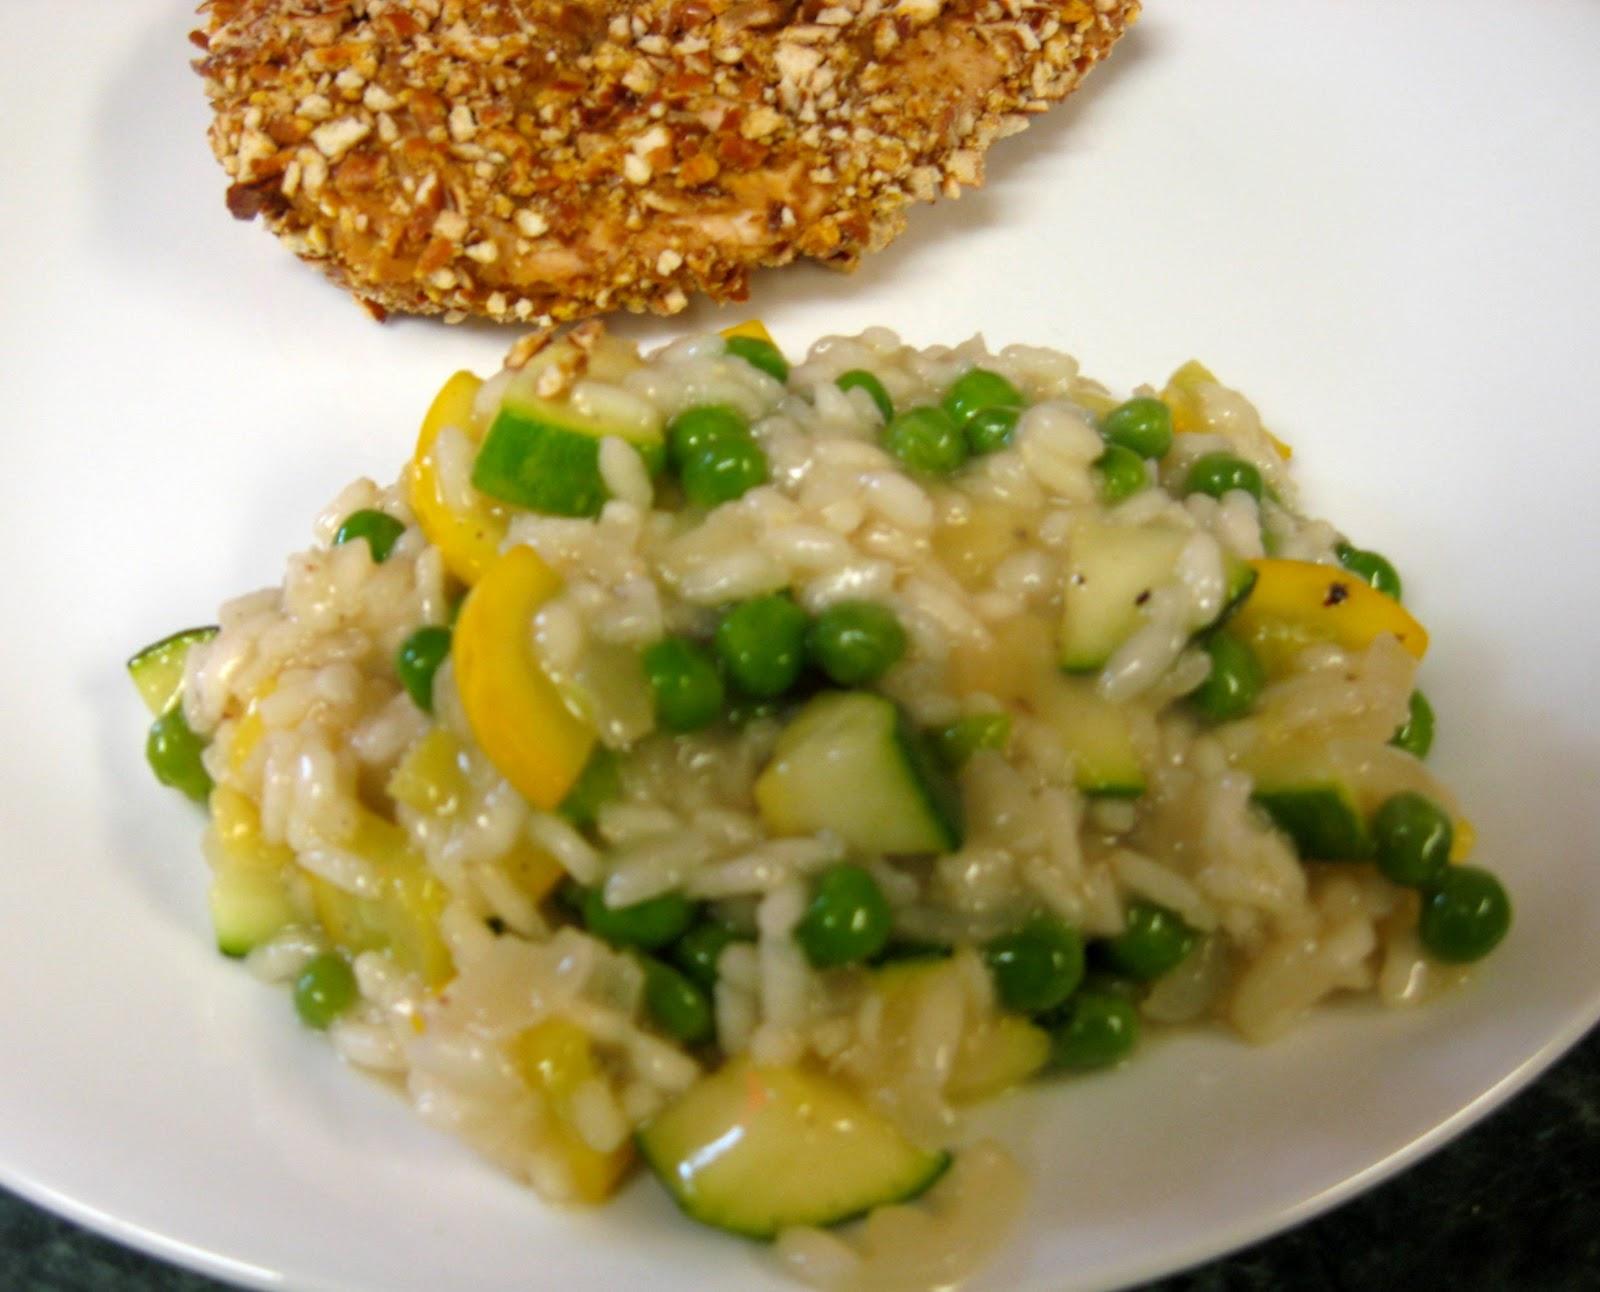 ... Dinner... Healthy & Low Calorie: Summer Squash, Zucchini & Pea Ri...